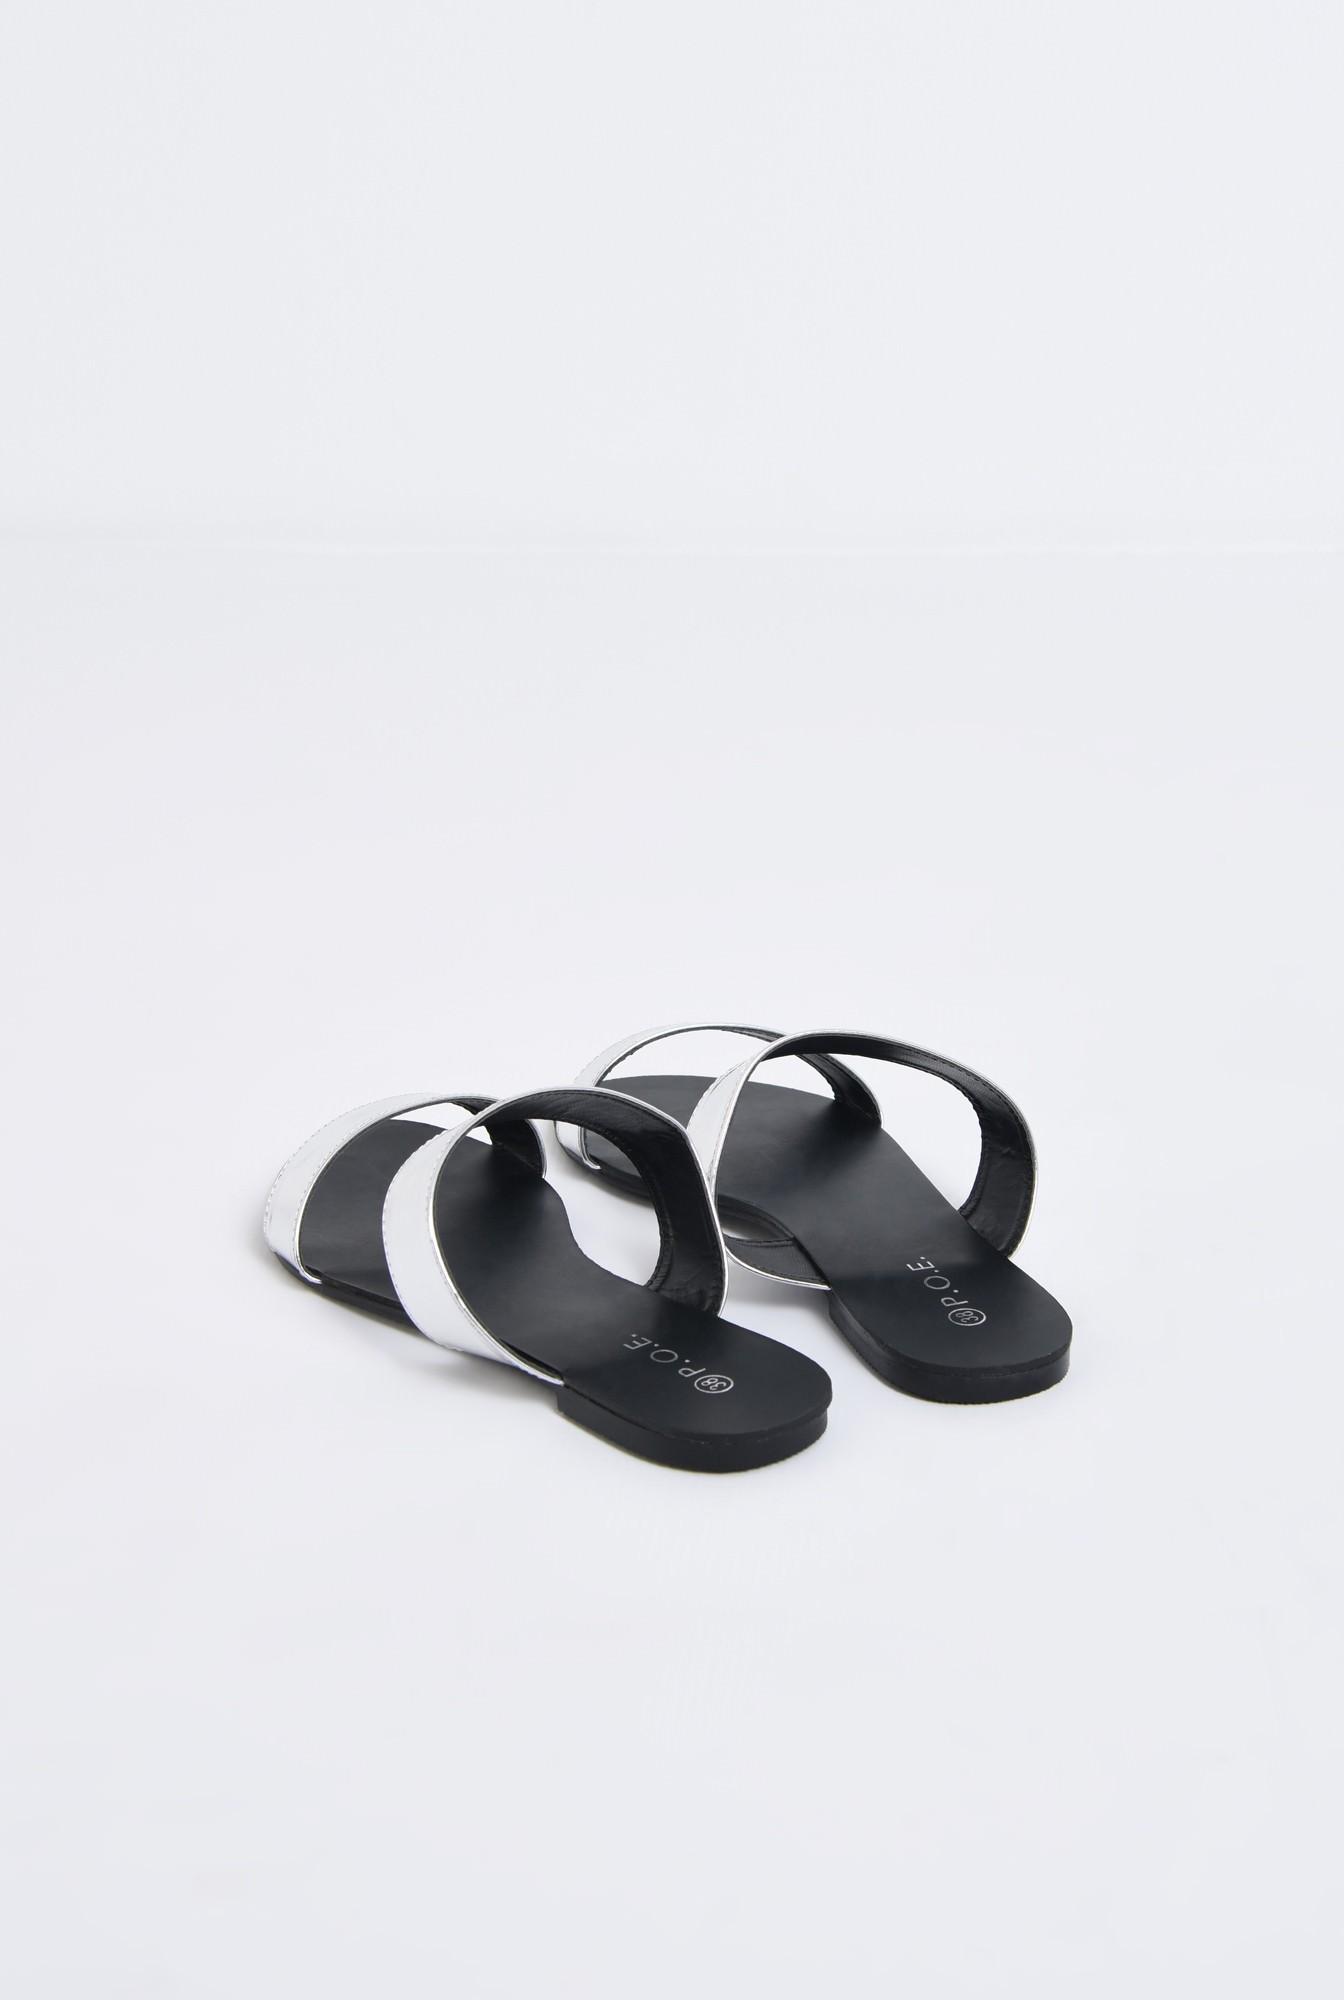 2 - papuci argintii, aspect metalic, cu talpa joasa